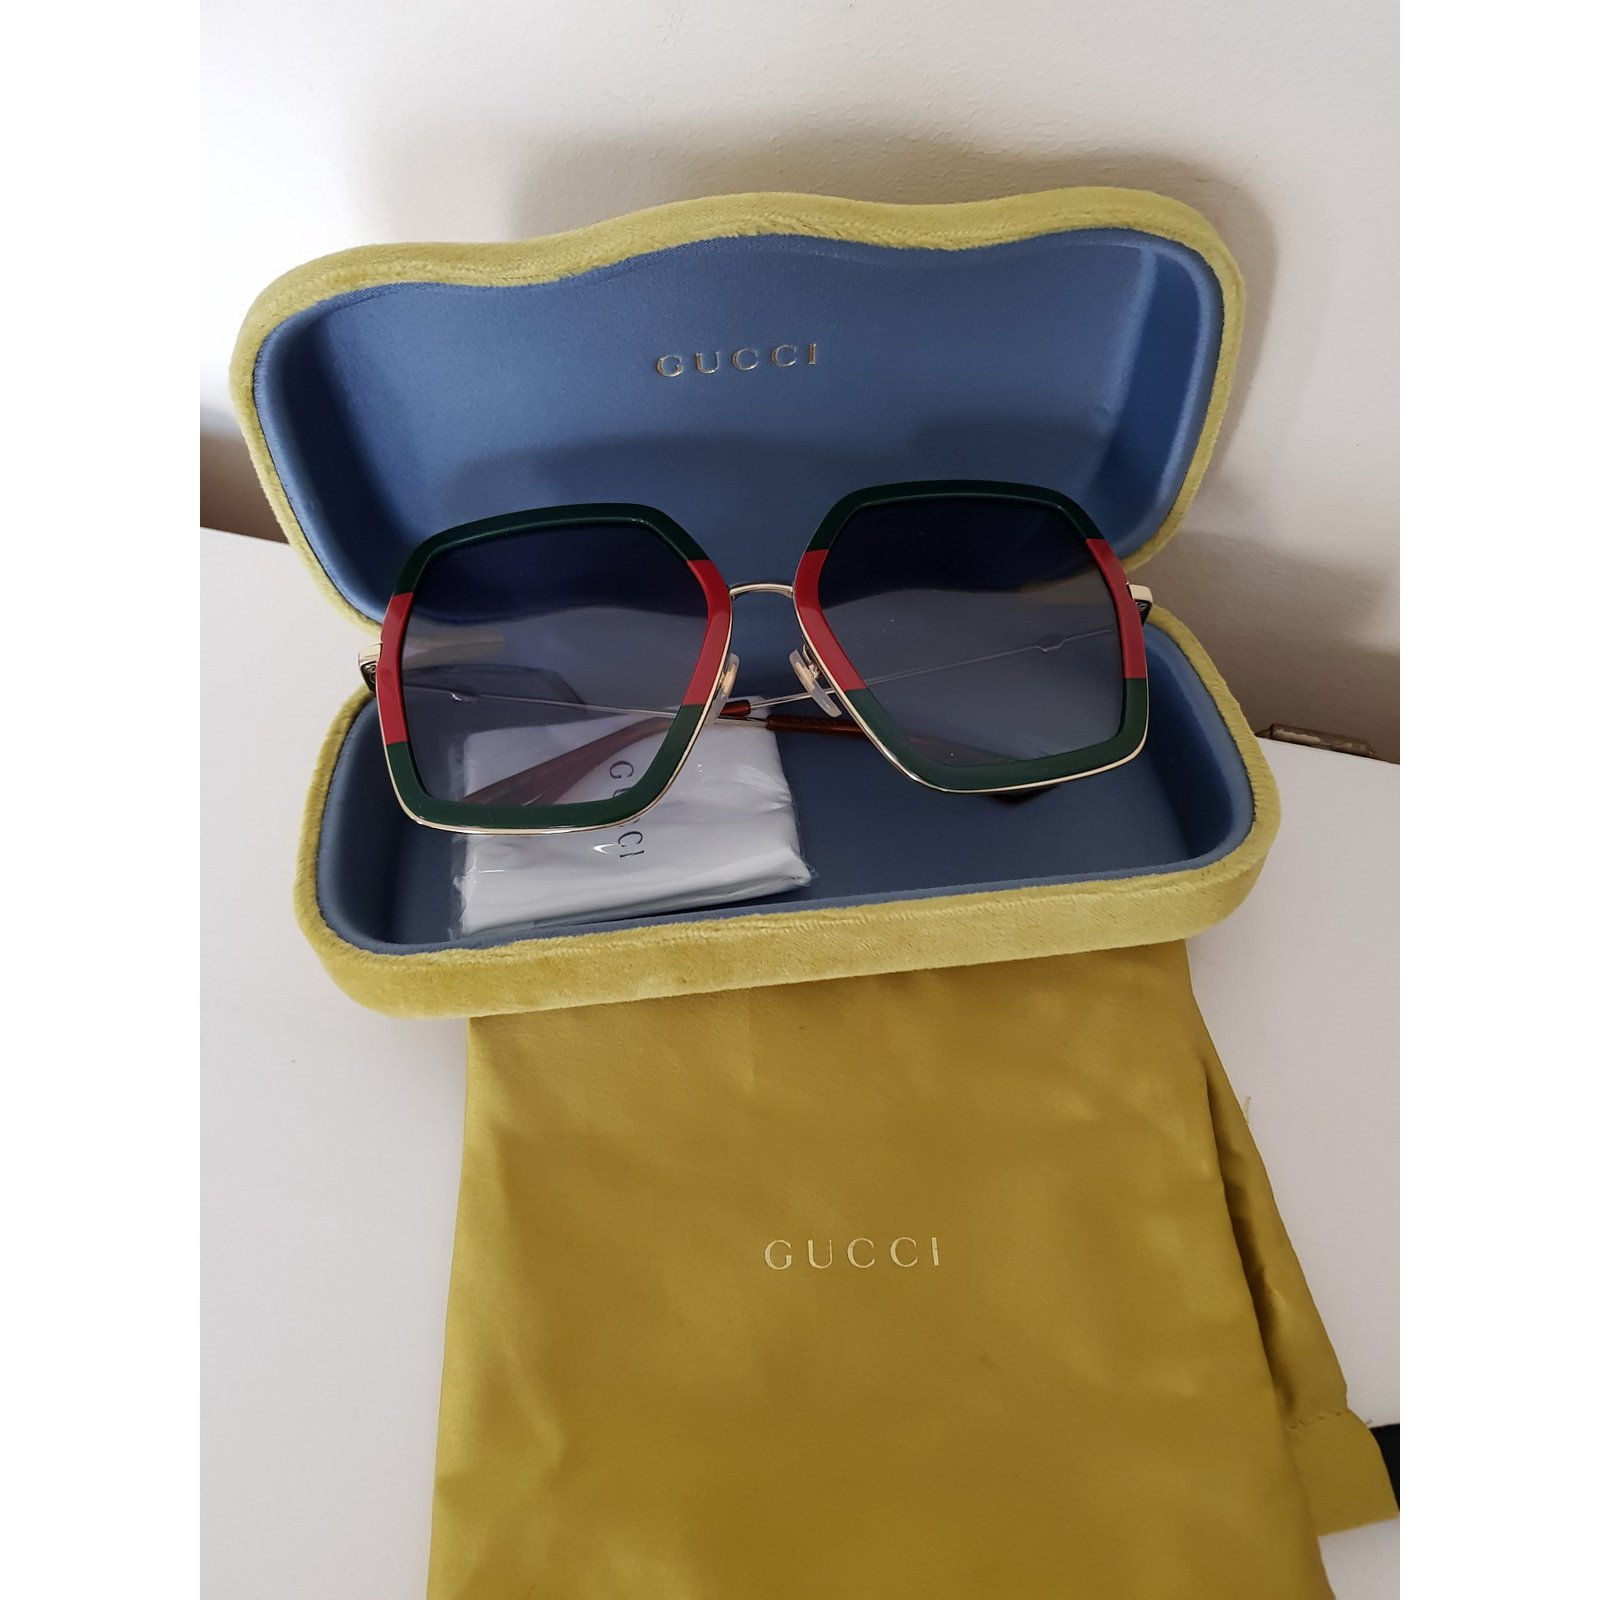 9acf68dec6f Gucci Sunglasses Sunglasses Acrylic Multiple colors ref.73004 - Joli Closet